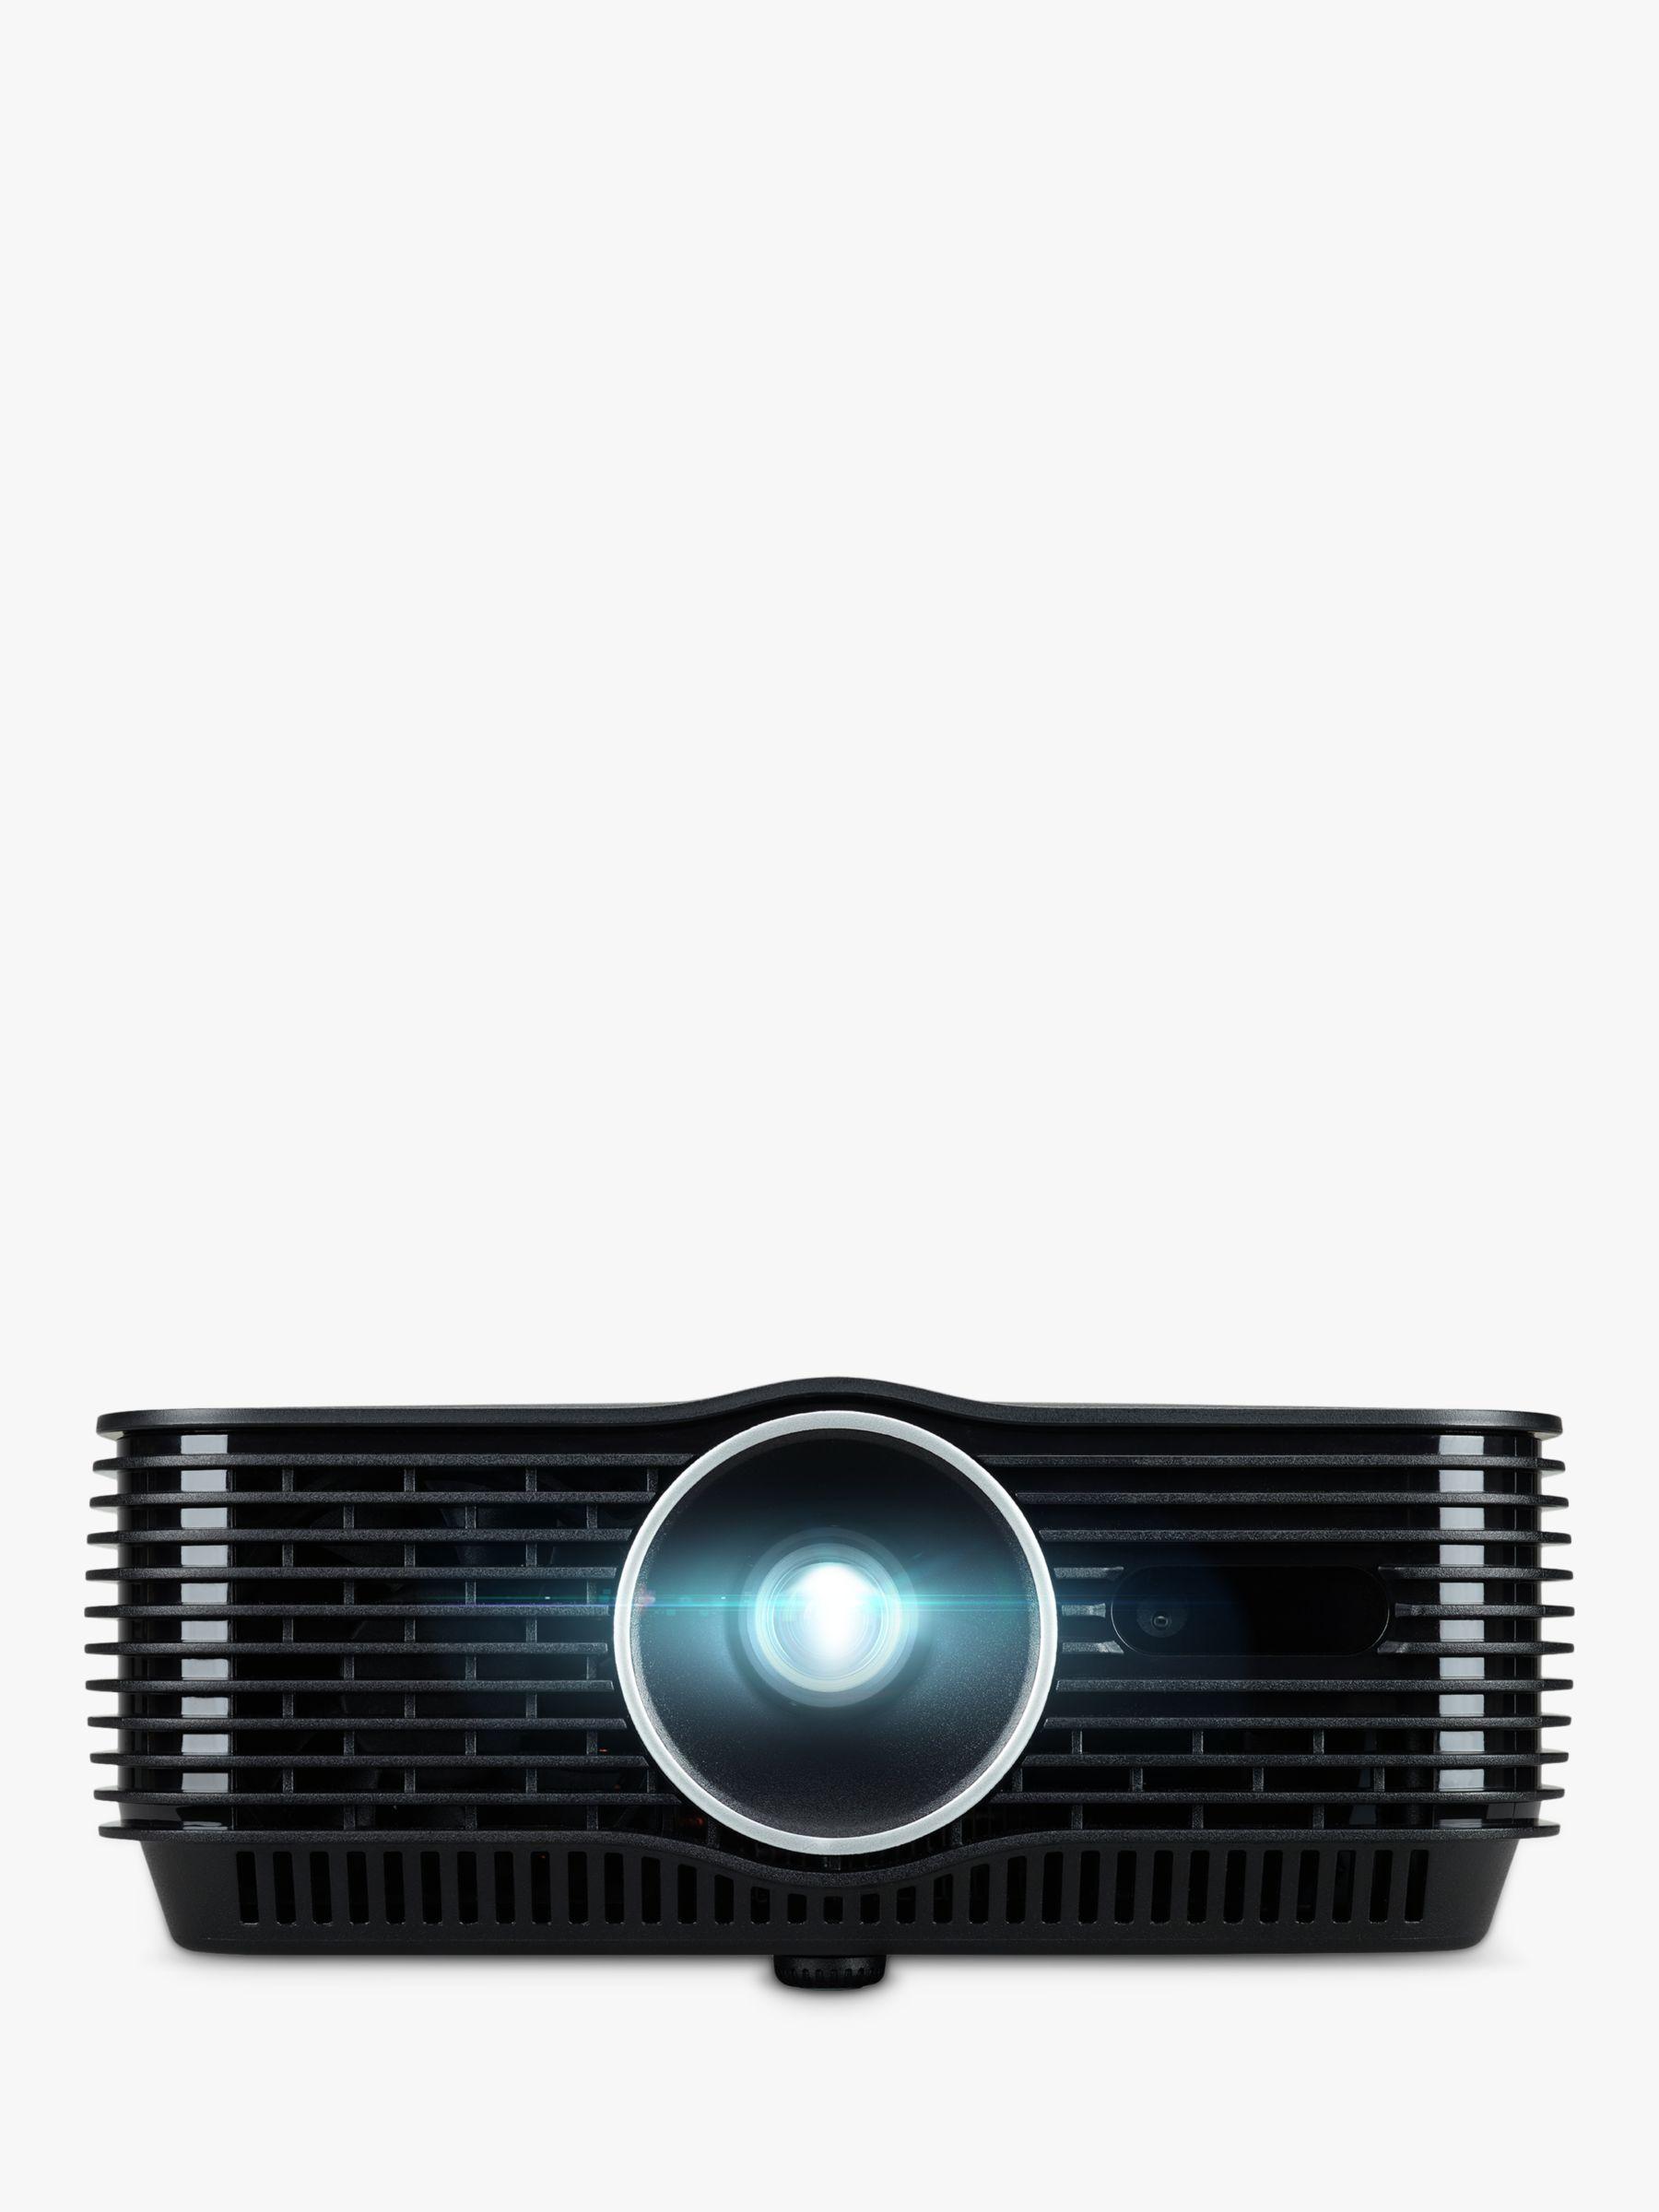 Acer B250i 1080p Full HD 3D Portable Projector, 1200 Lumens